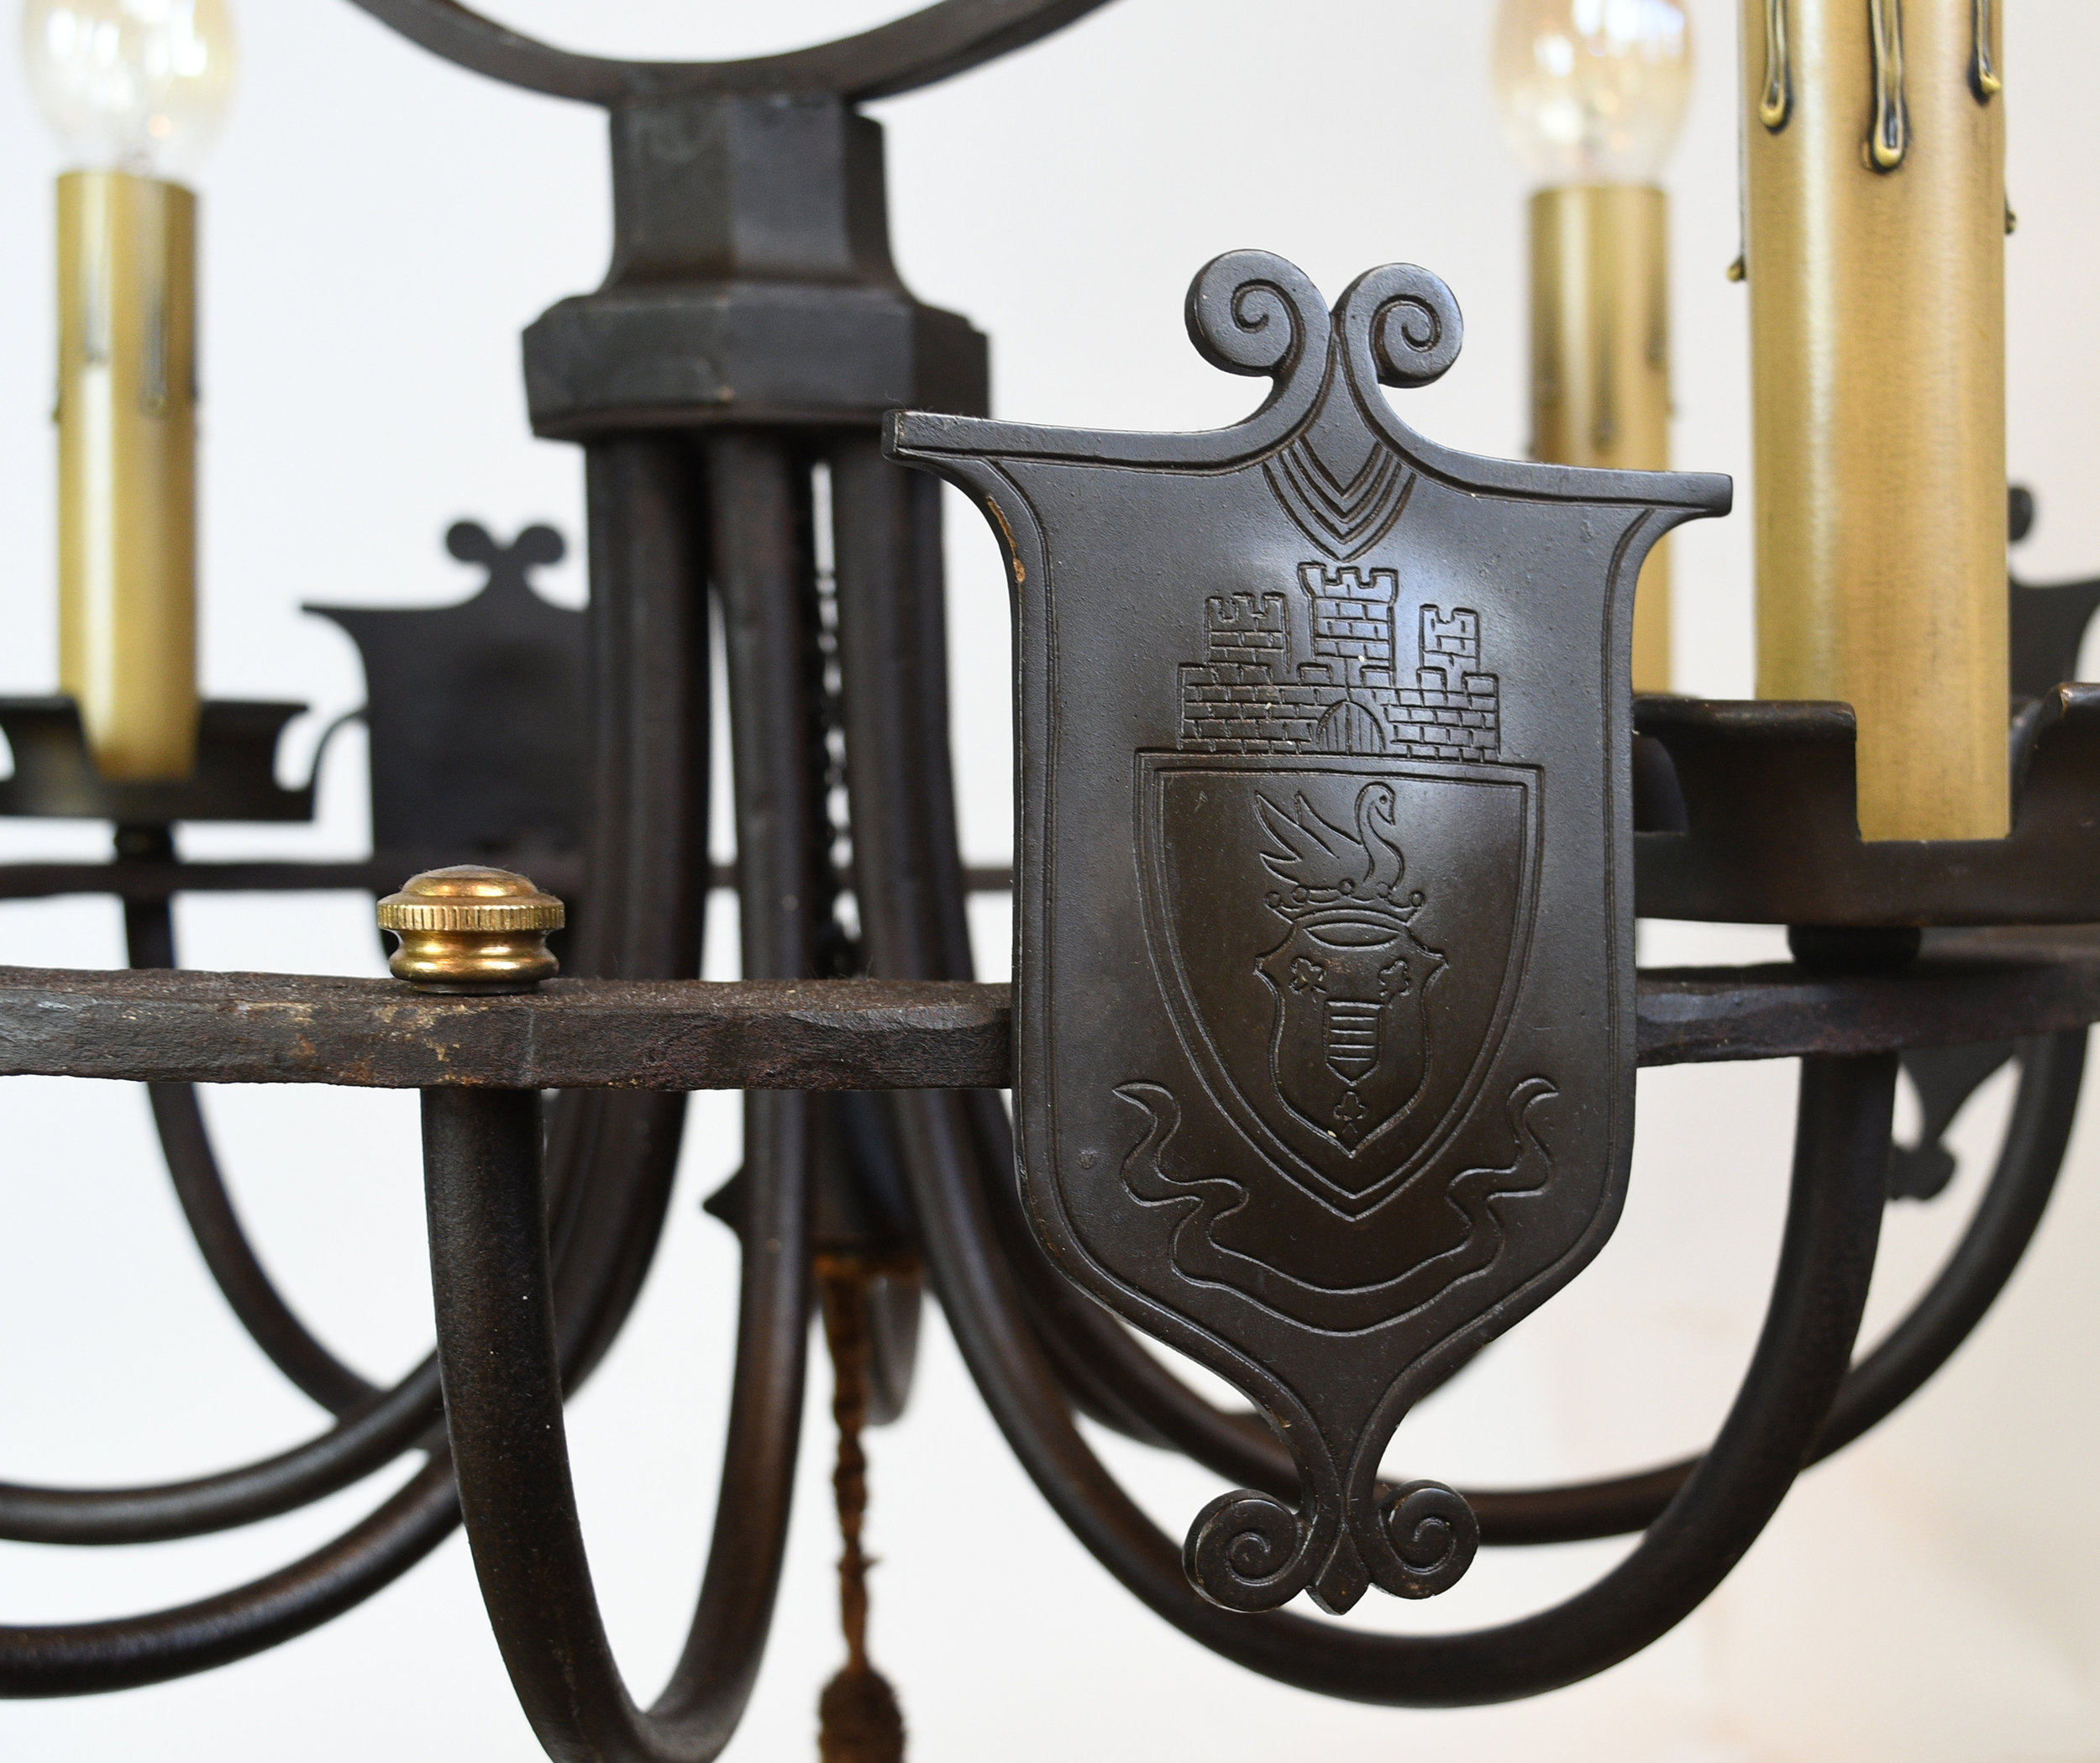 47538-iron-tudor-chand-with-hoop-shield-detail-17.jpg